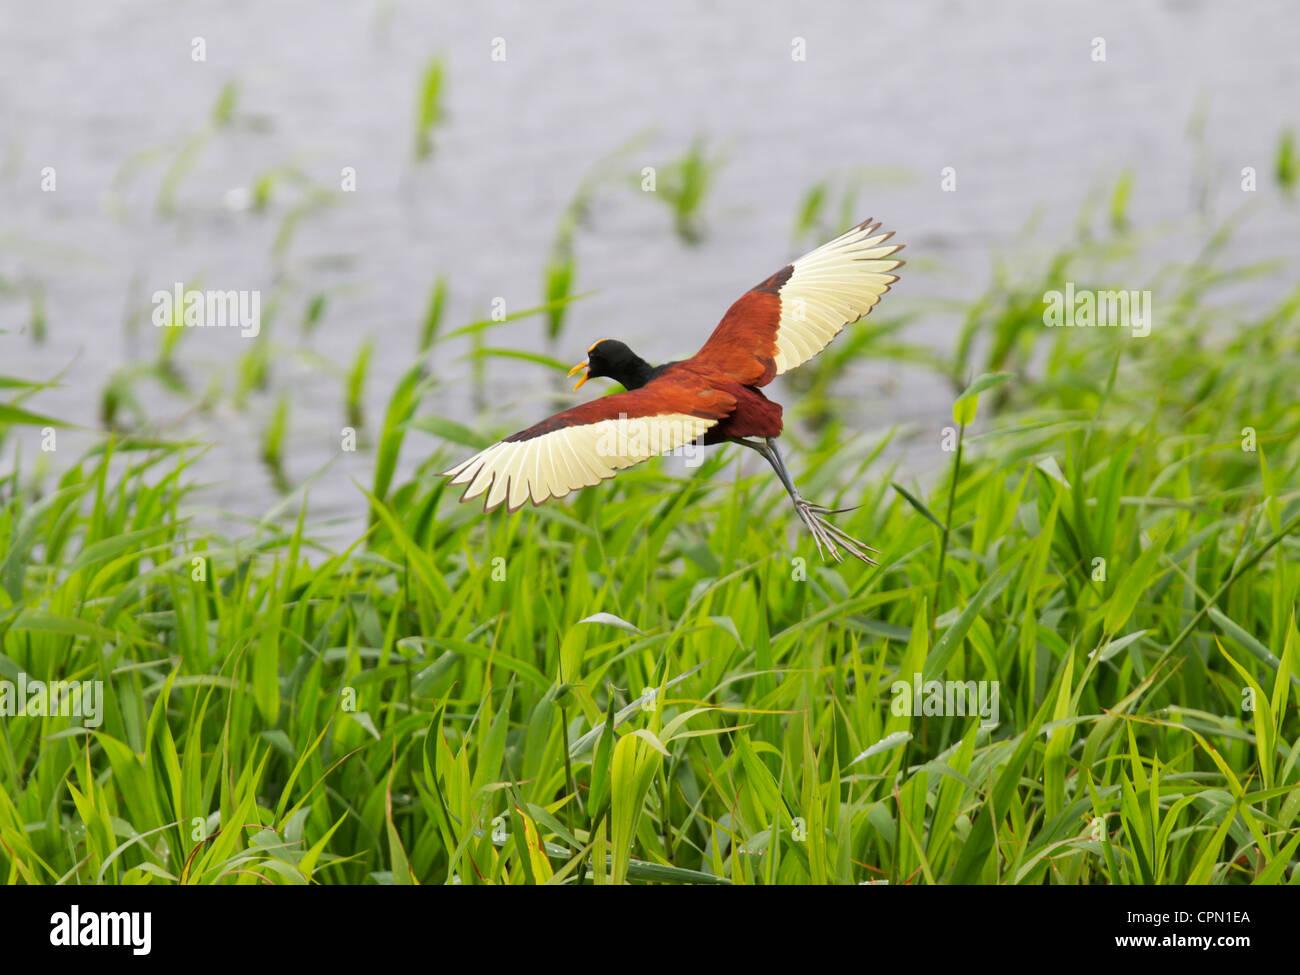 Northern jacana flying over lake Arenal, Costa Rica - Stock Image